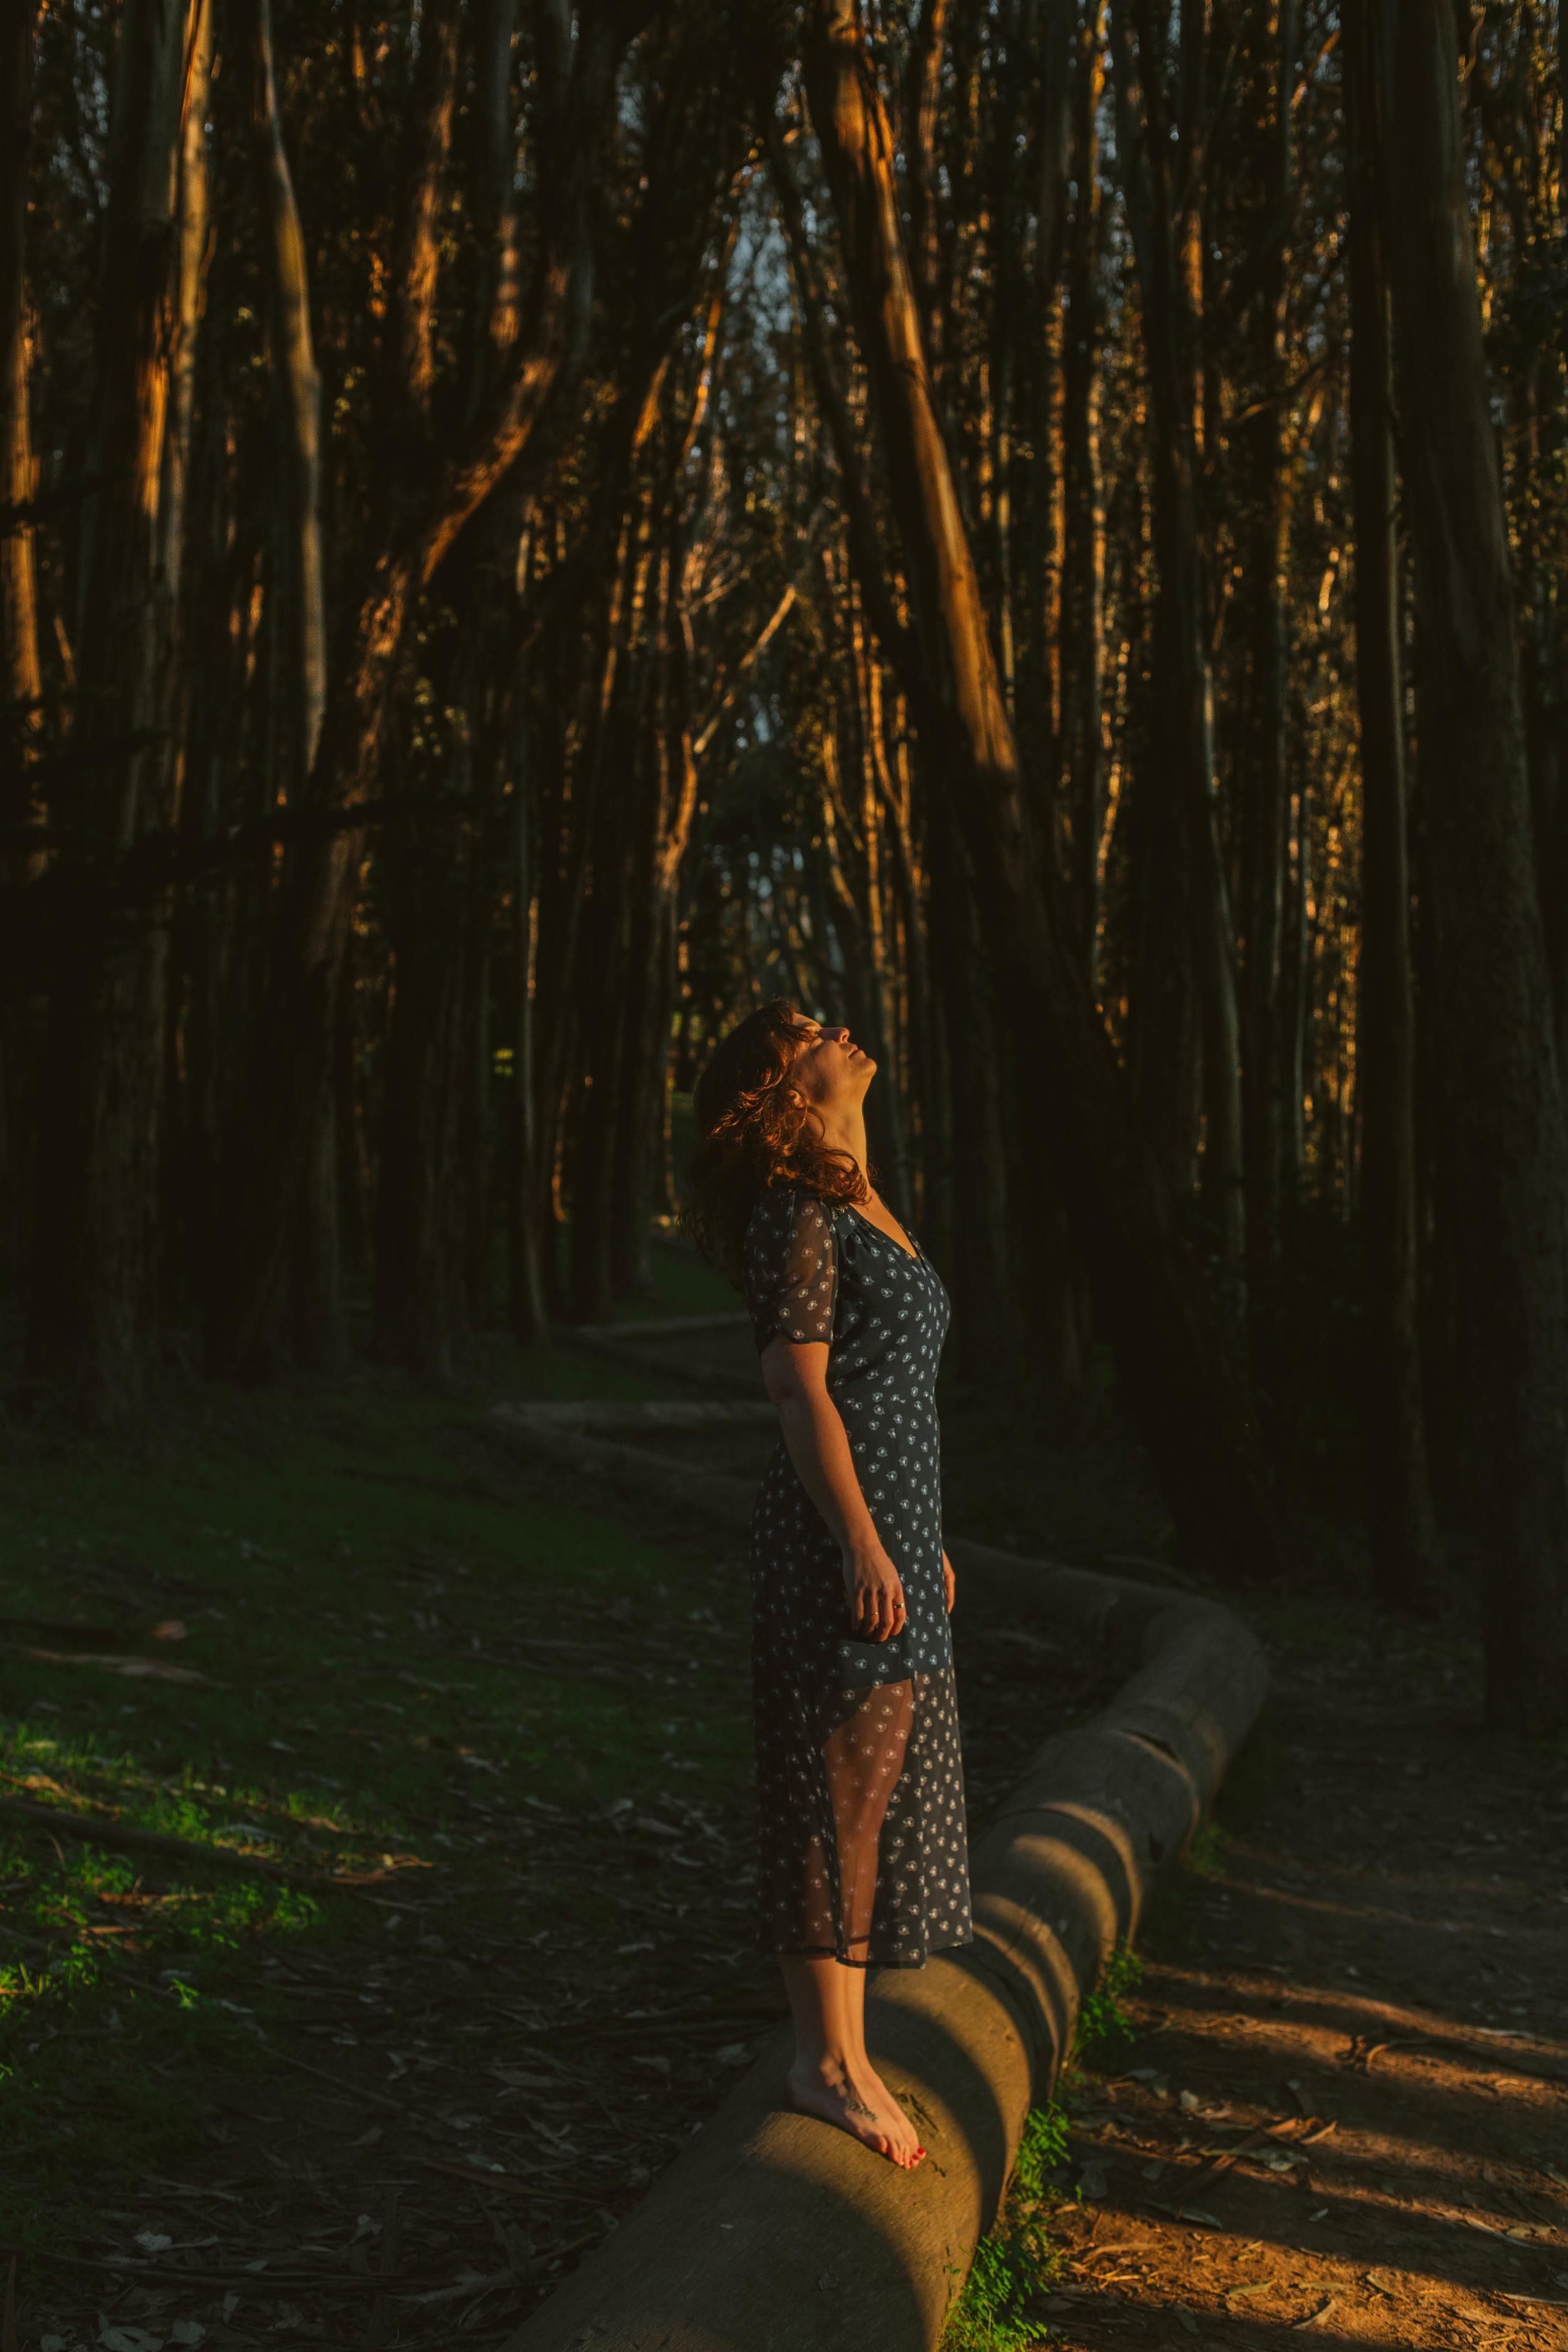 forestsun.jpg